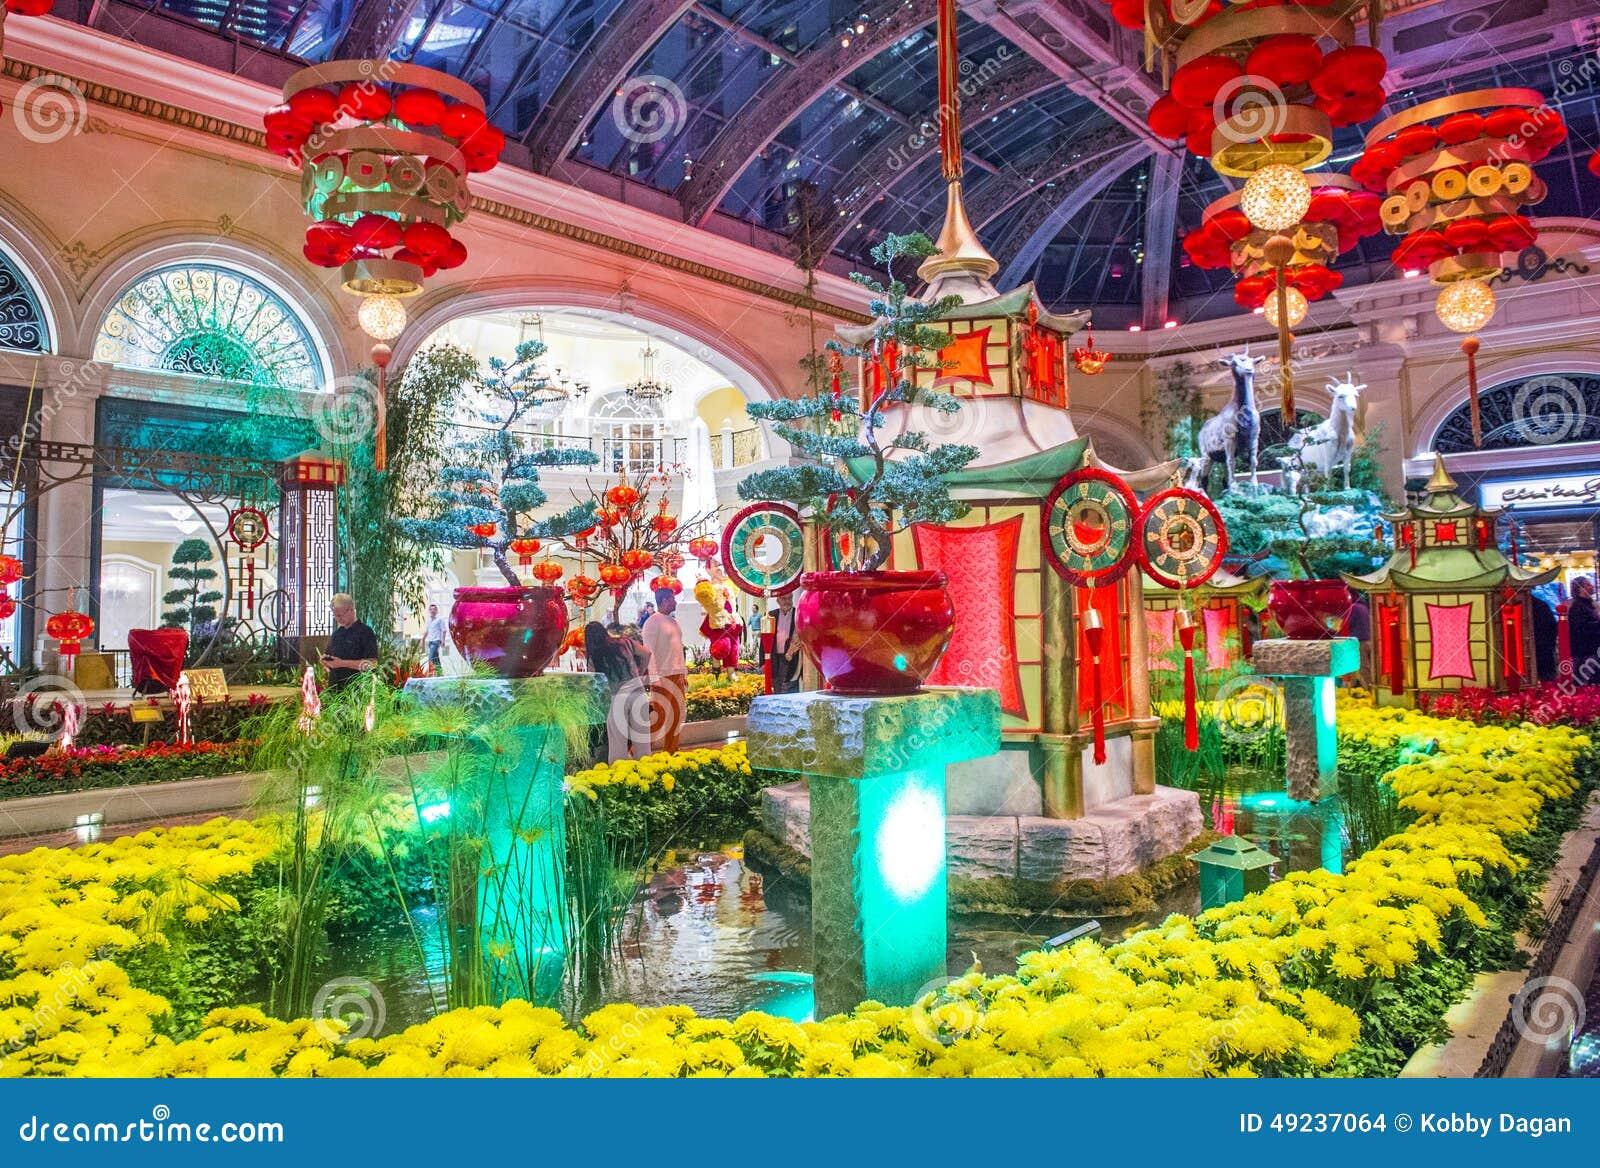 Bellagio Hotel Conservatory Botanical Gardens Editorial Stock Image Image 49237064